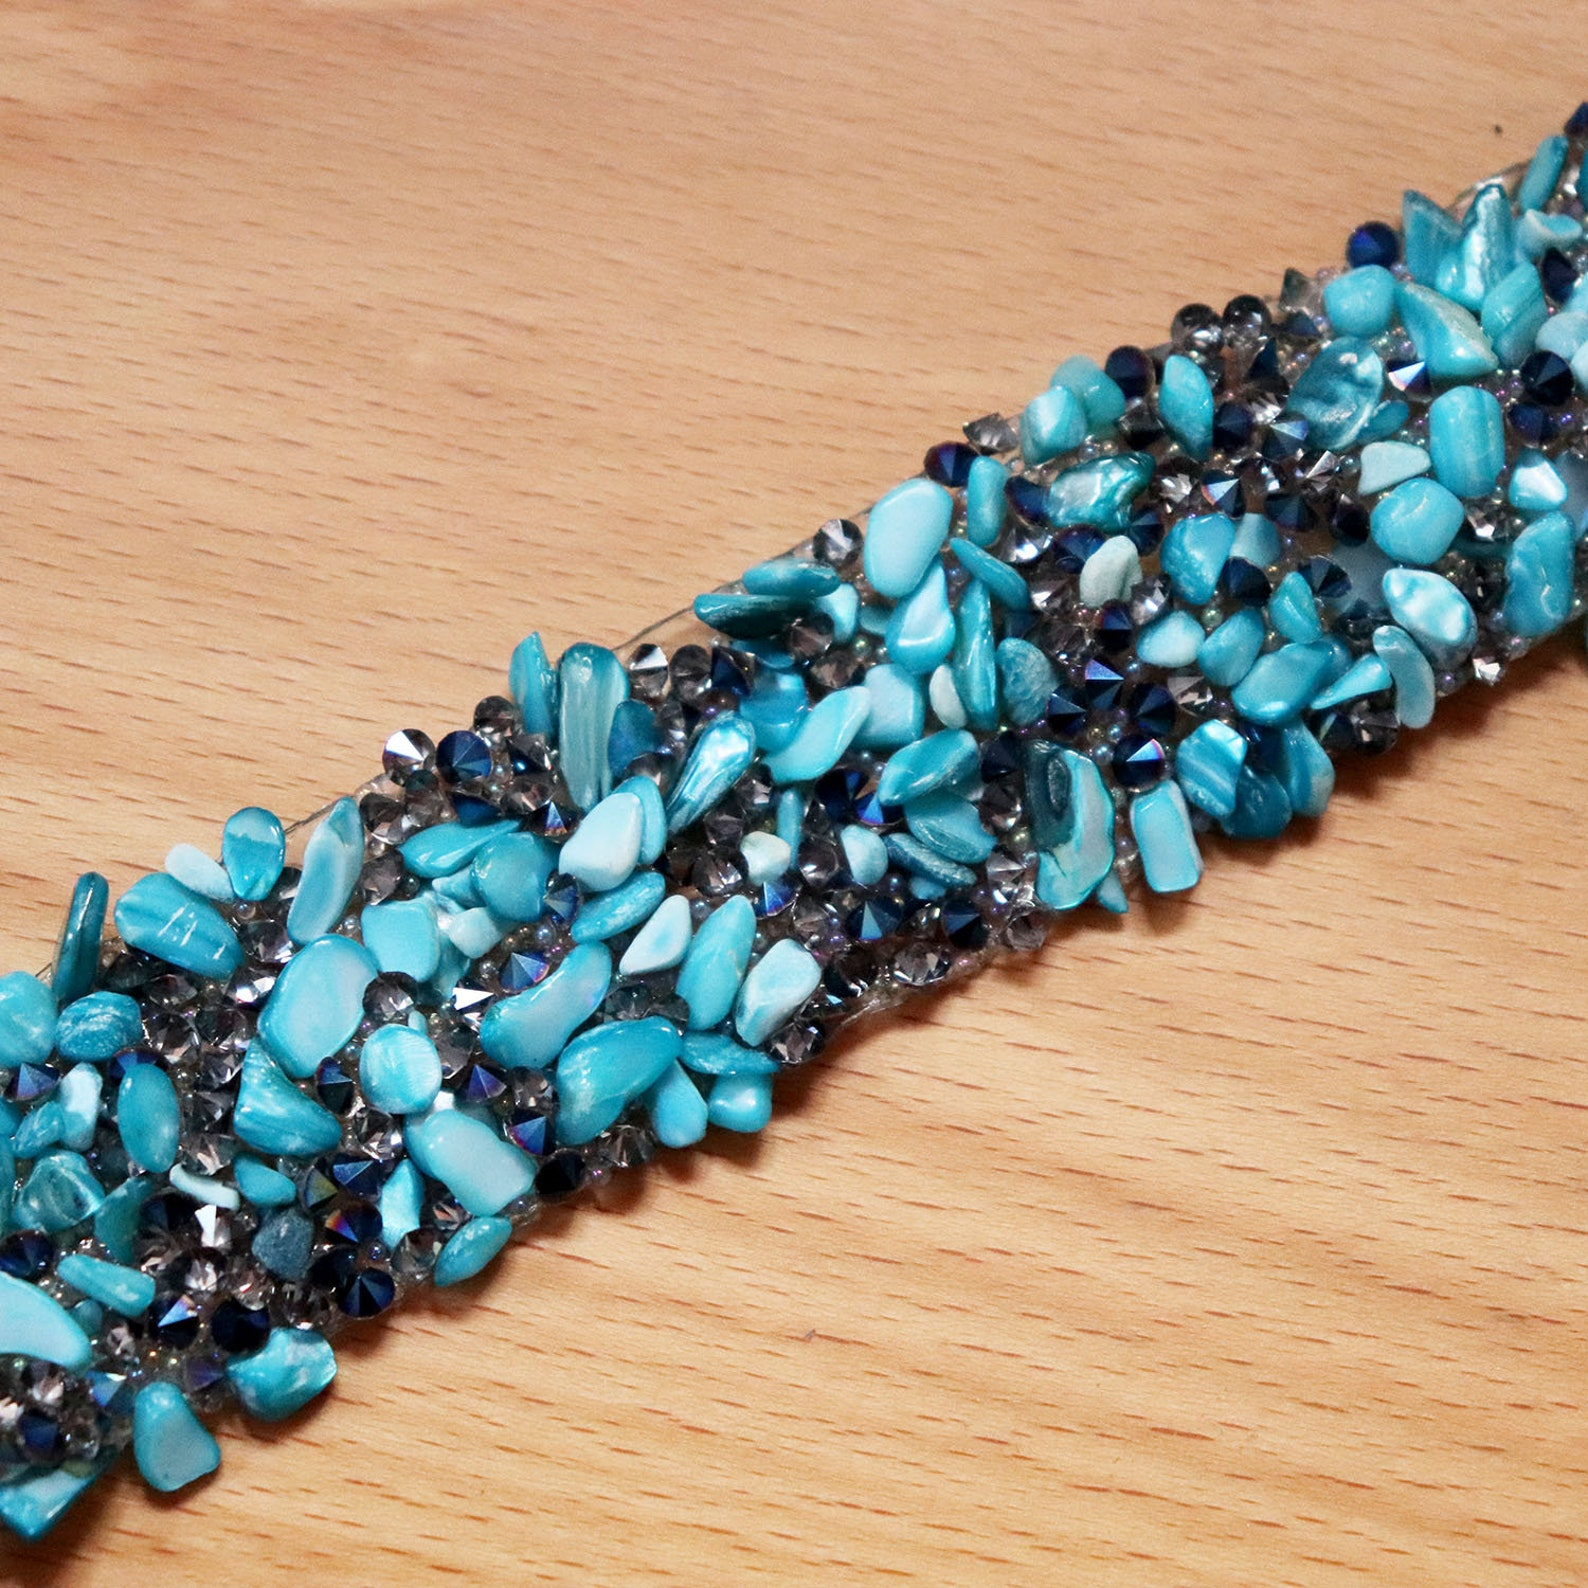 1meter 2.5cm wide ballet skirt beaded crystal lace trim paillette trim wedding party cake decor clothing accessories diy blue